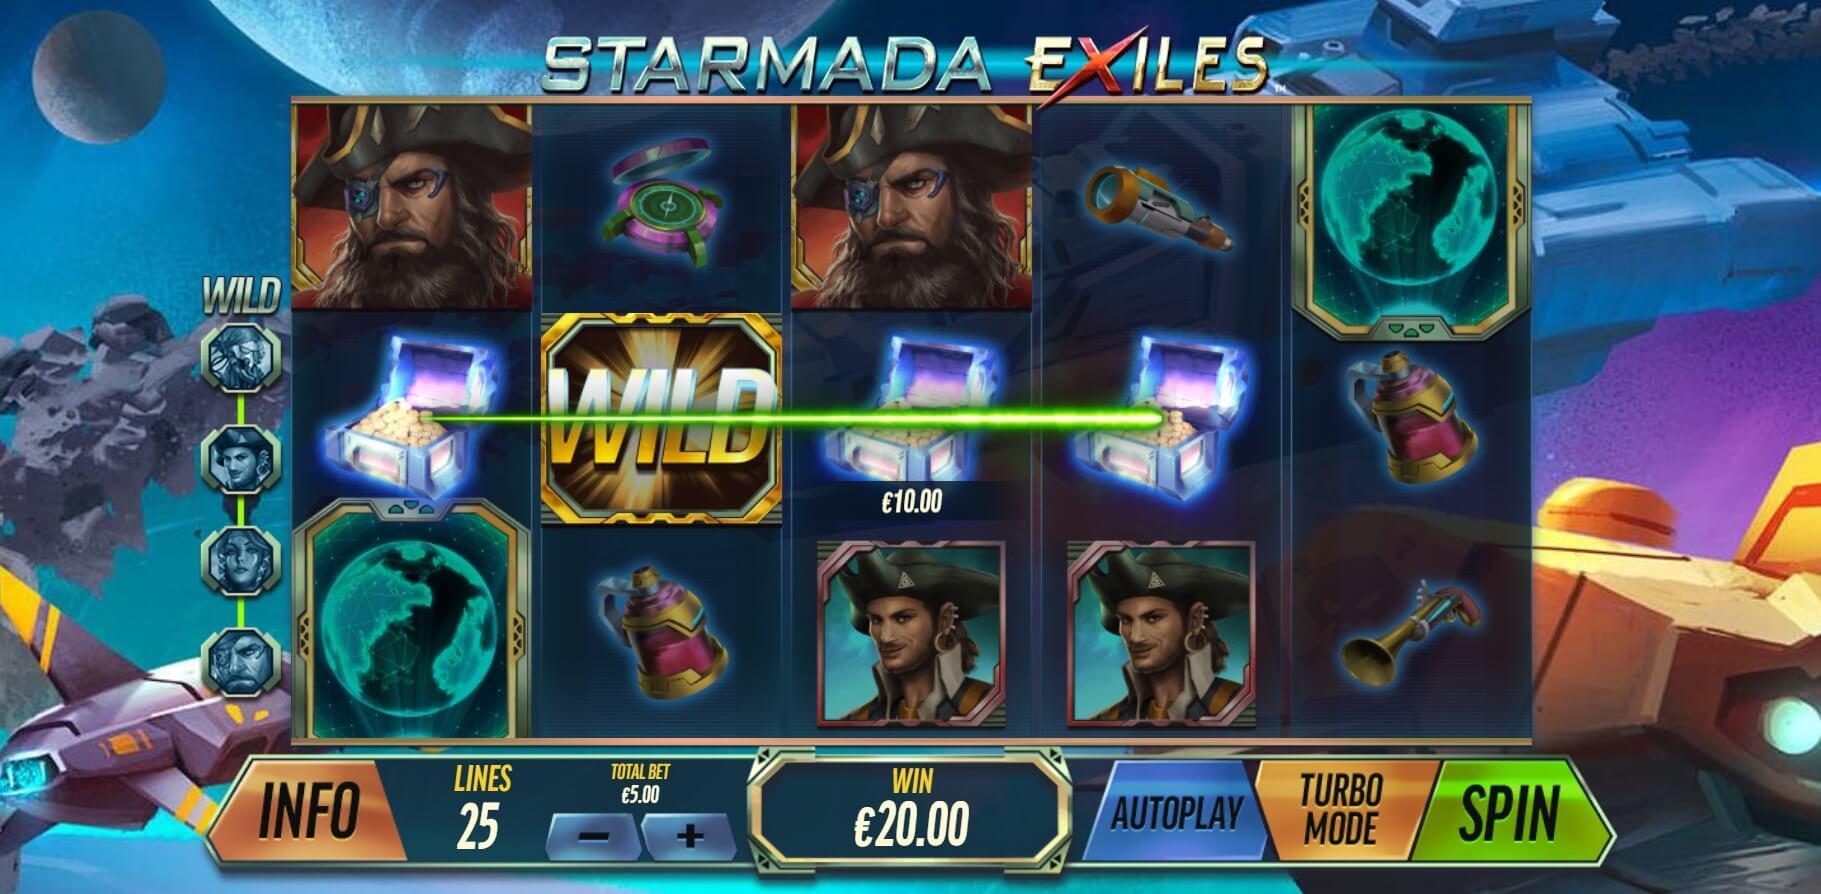 Spiele Starmada Exiles - Video Slots Online